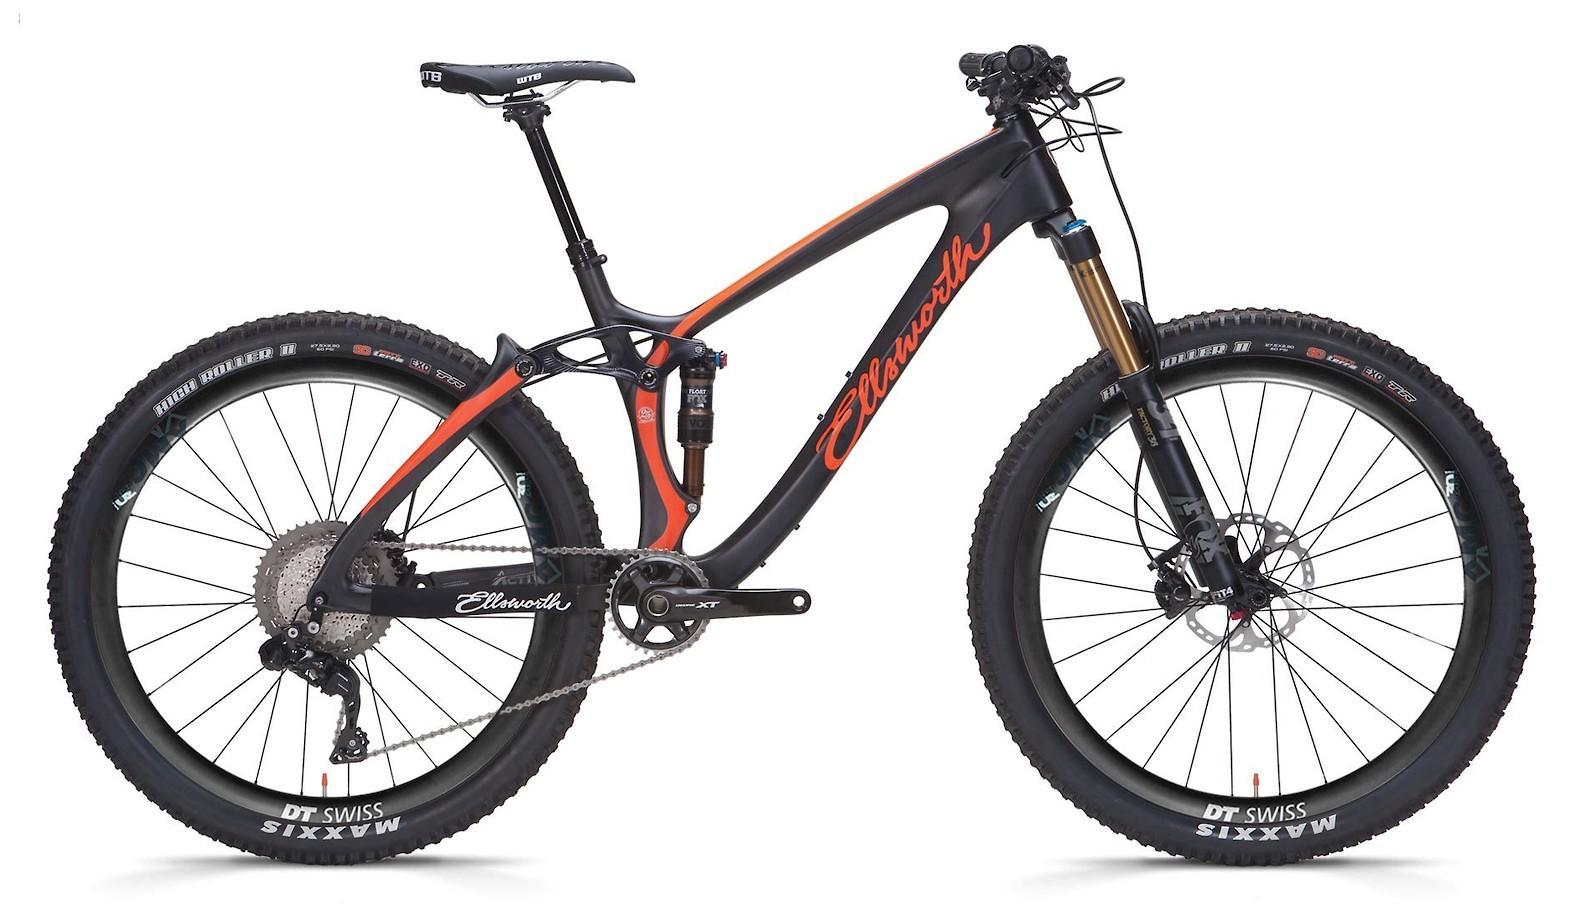 2019 Ellsworth Rogue Forty (Black/Orange; custom build shown)